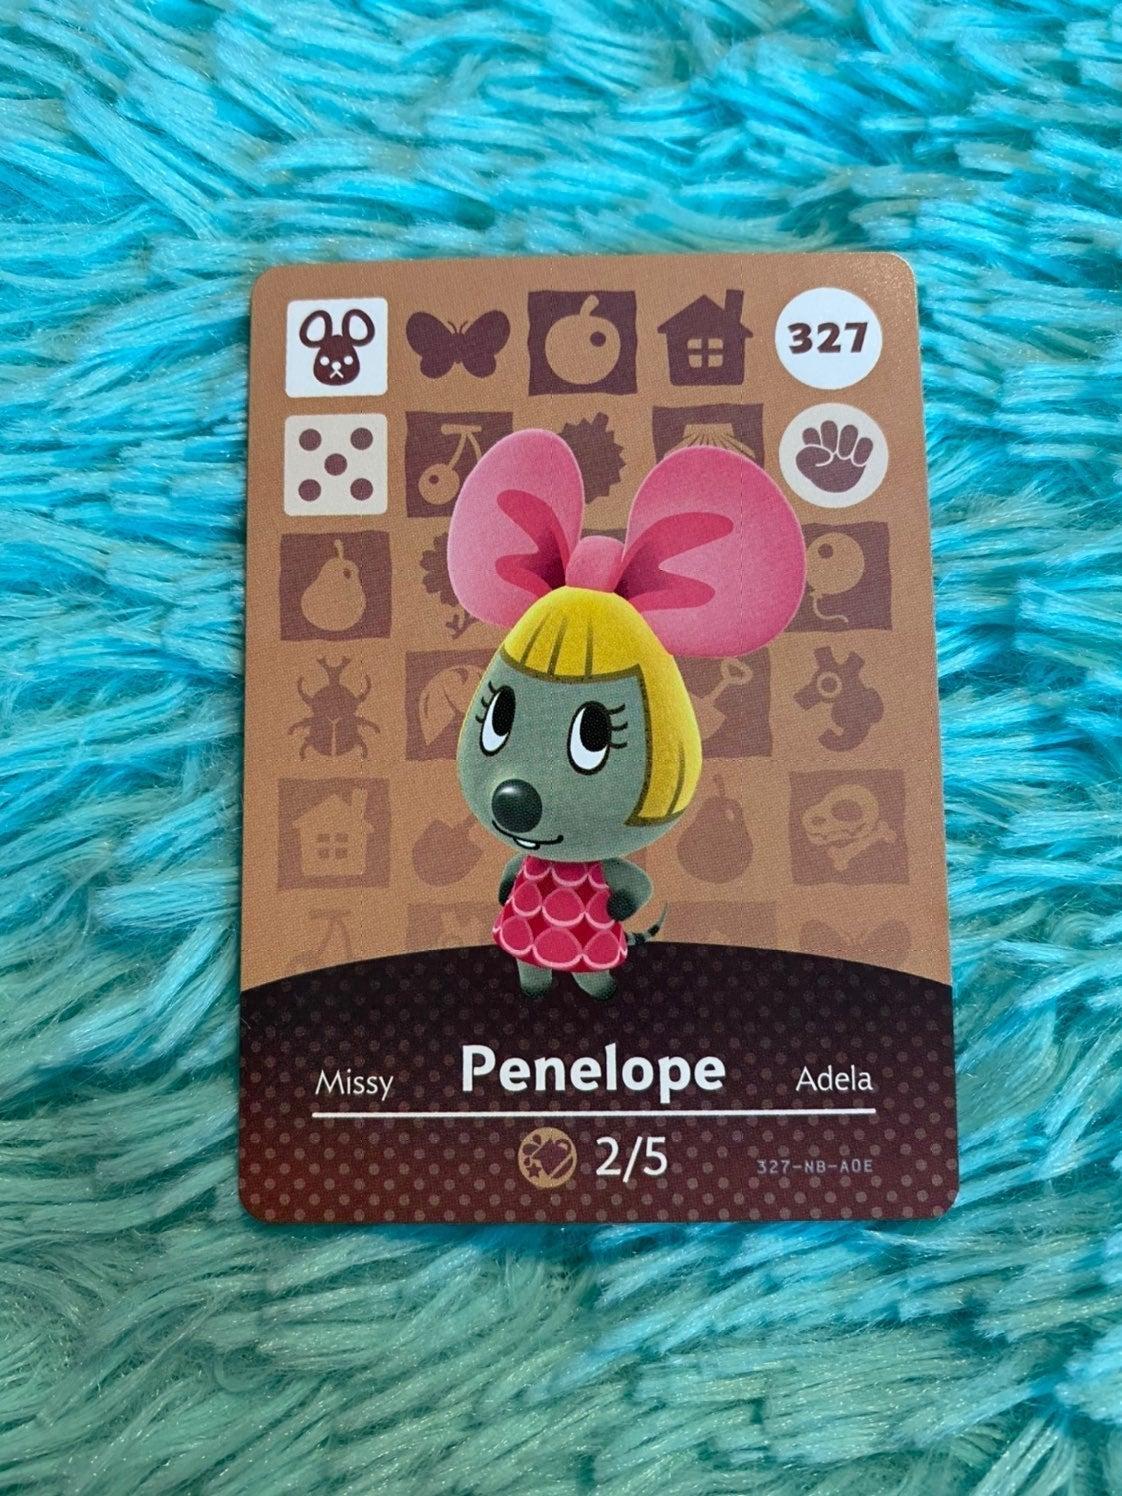 Penelope - Animal Crossing Amiibo Card